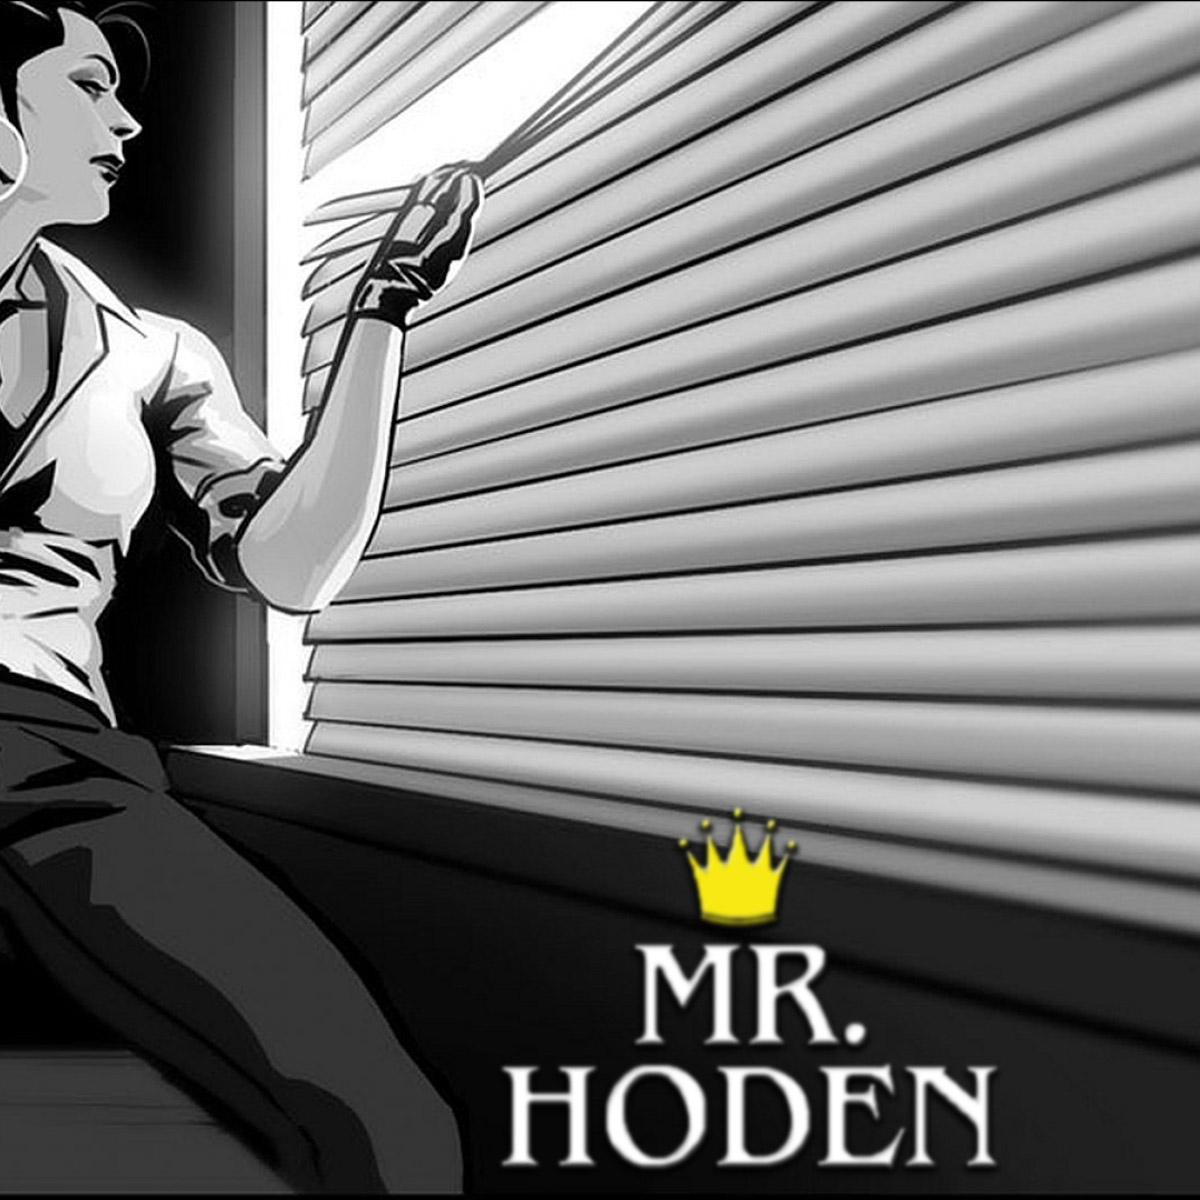 Upcoming: Mr. Hoden - Bada$$ Unrivalled Rap Beat 2019 [FREE BEAT]